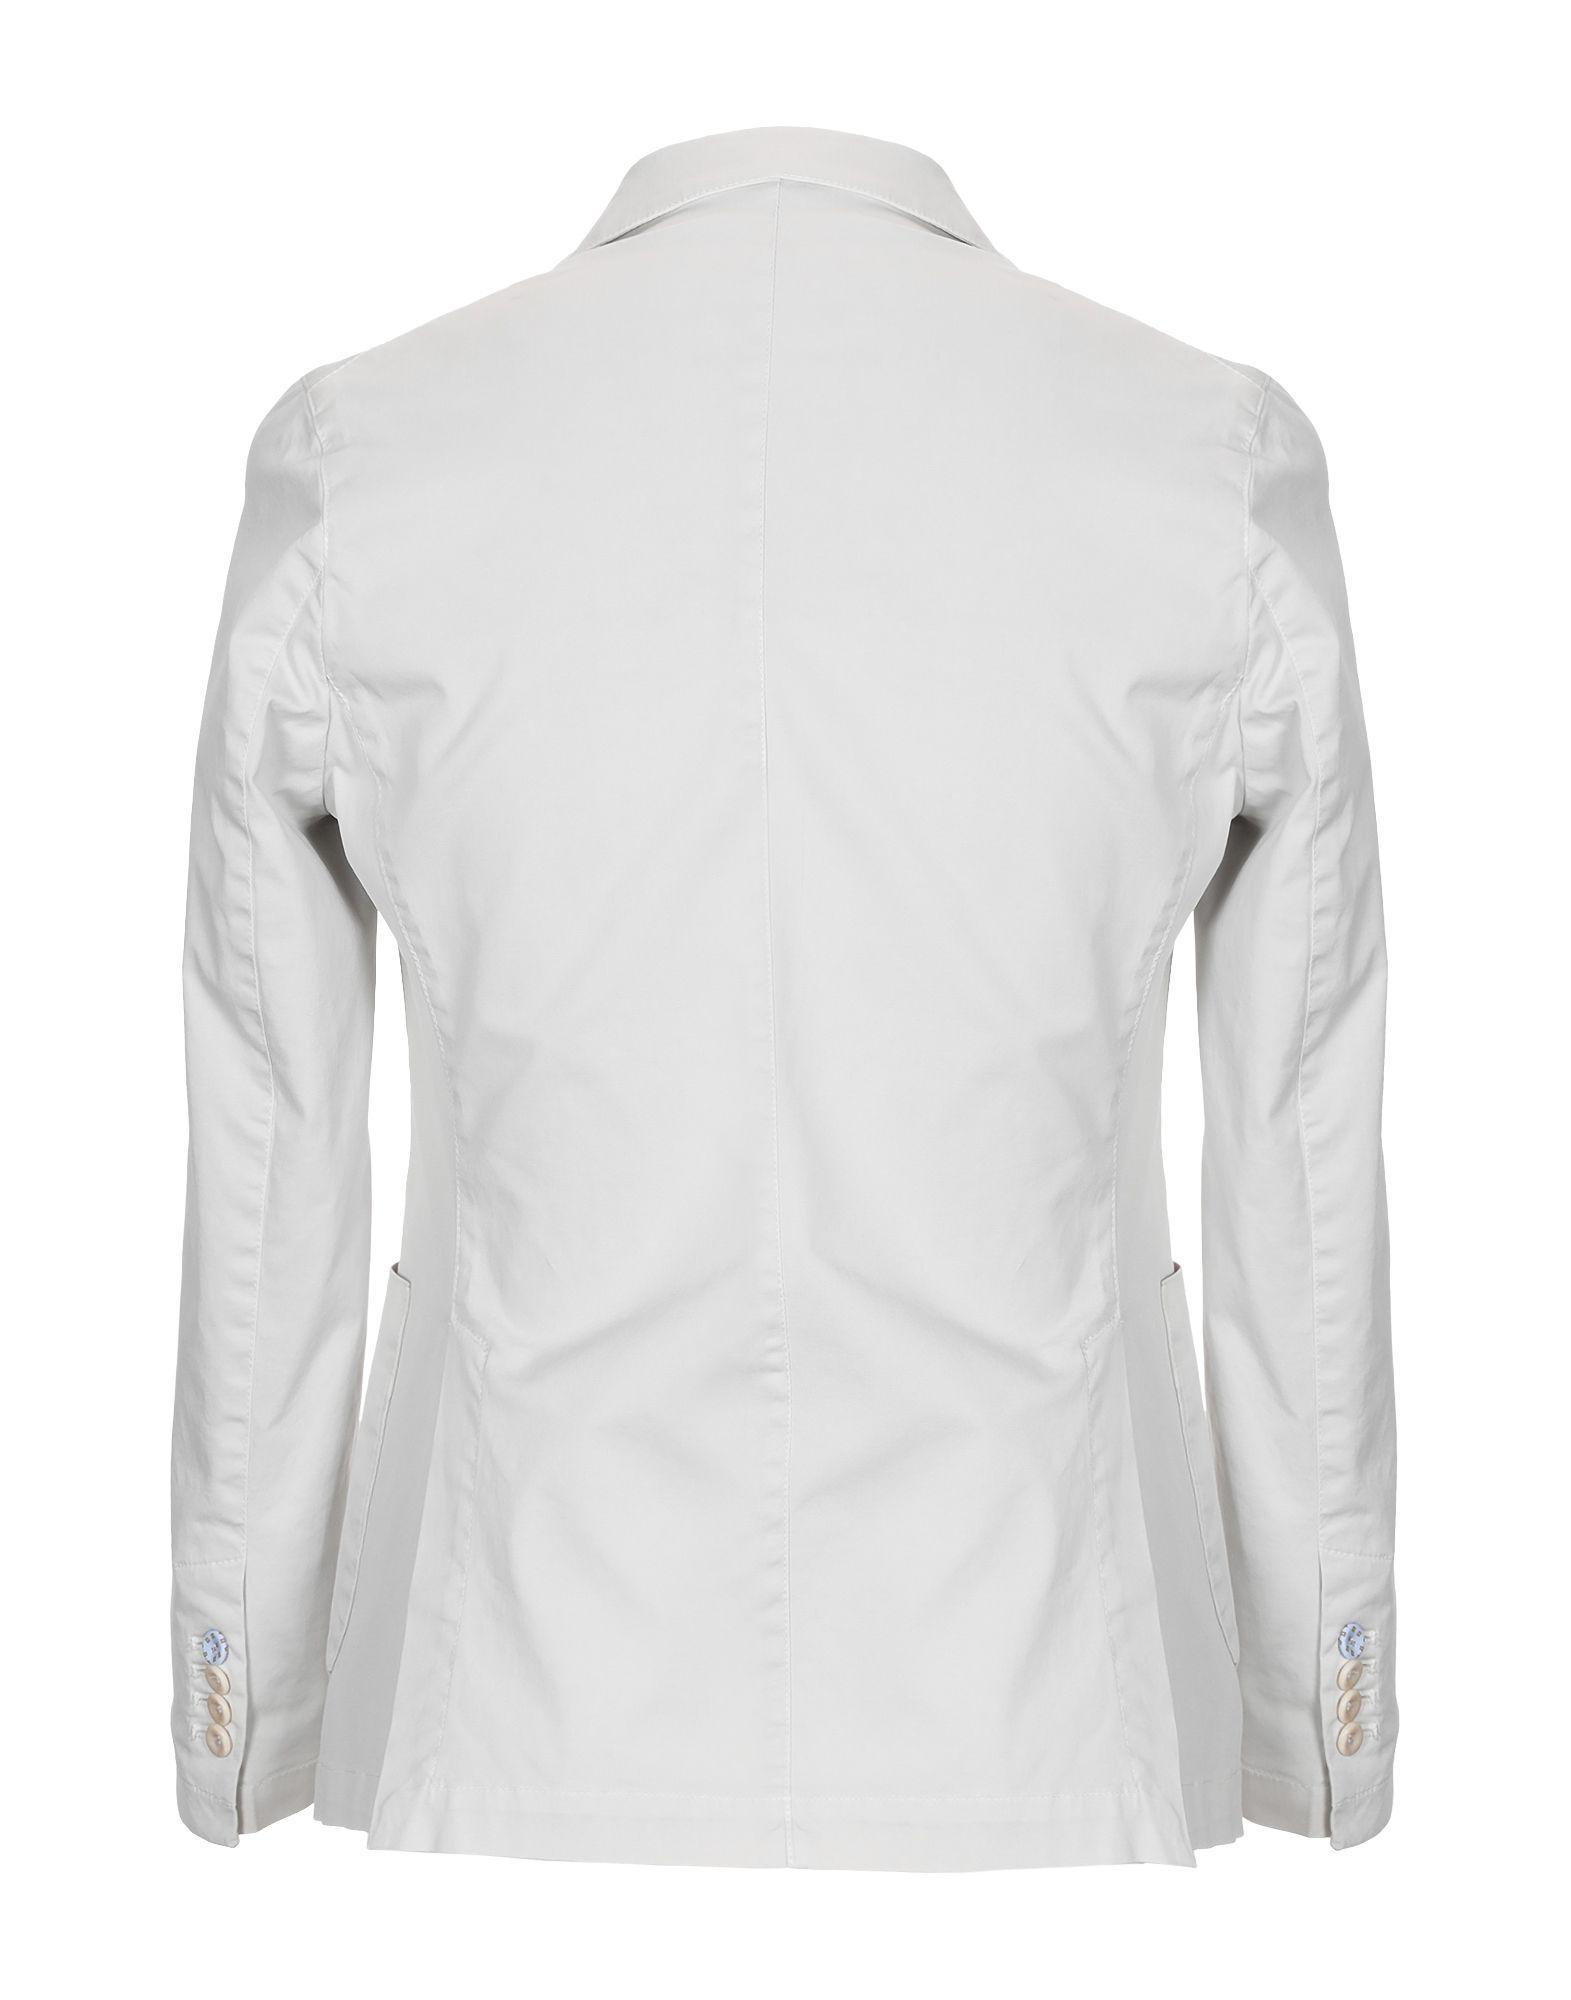 5bcc7a3923 Lyst - Barbati Blazer in Gray for Men